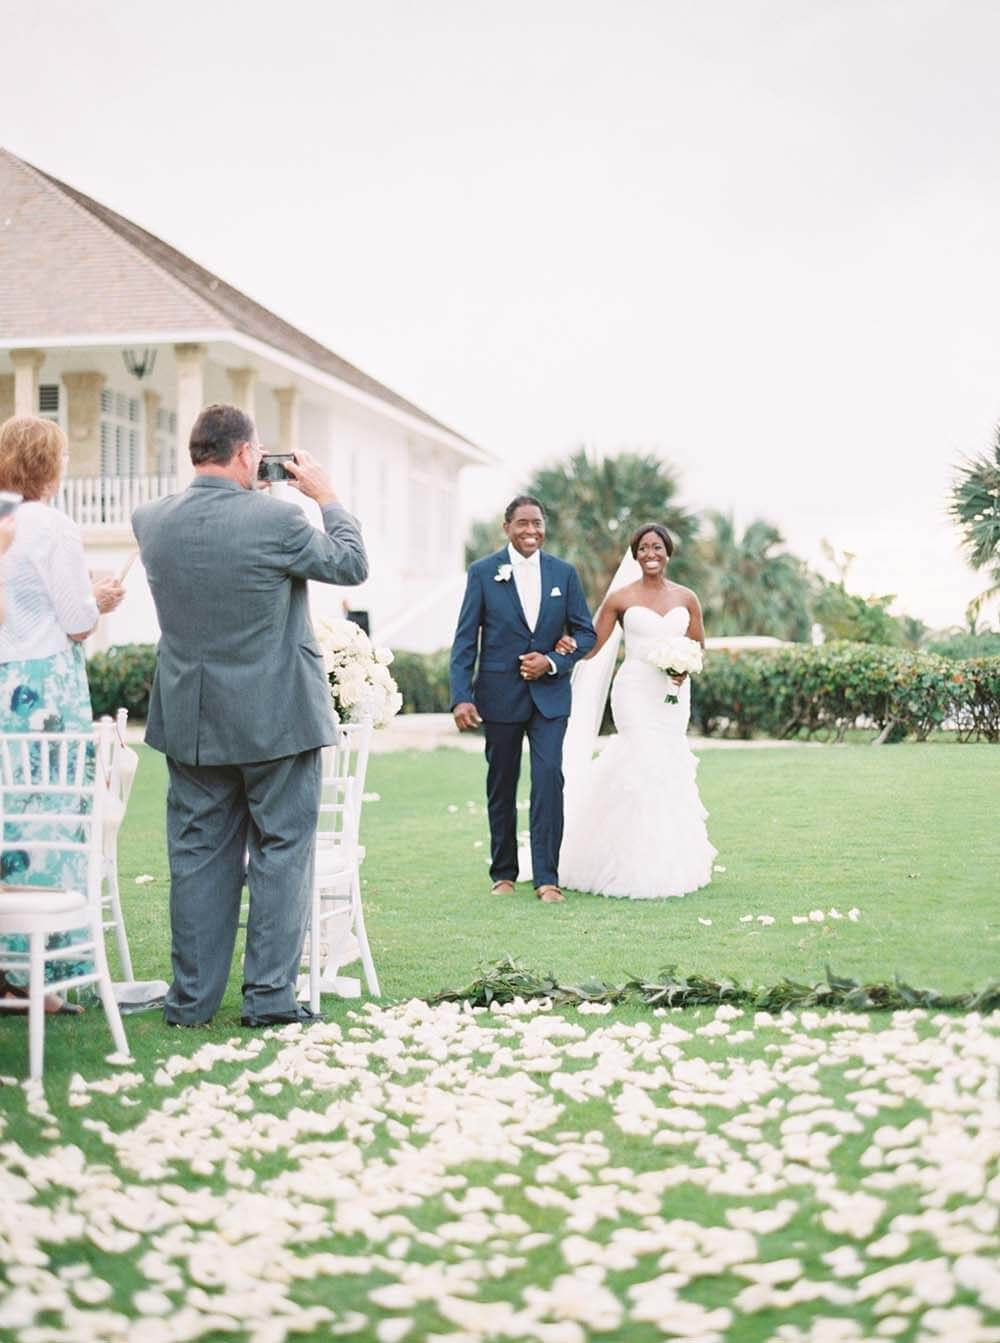 Couple taking wedding photos